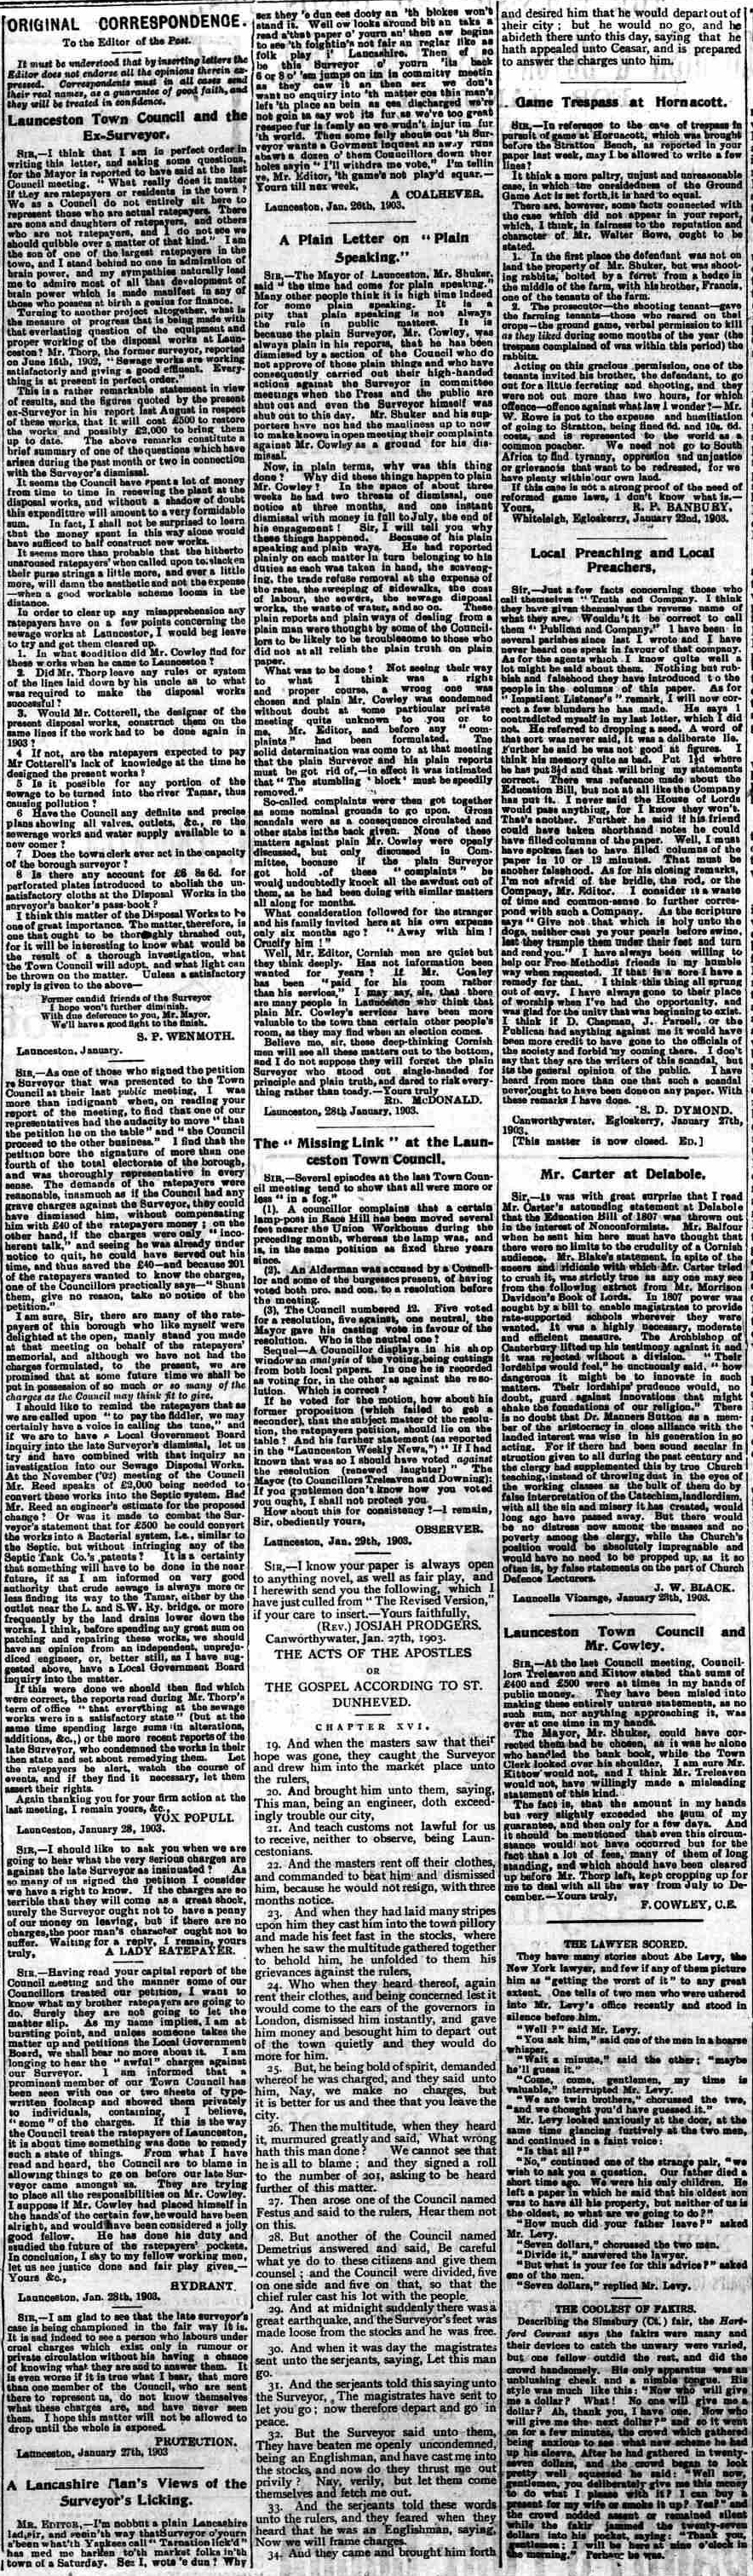 31 January 1903